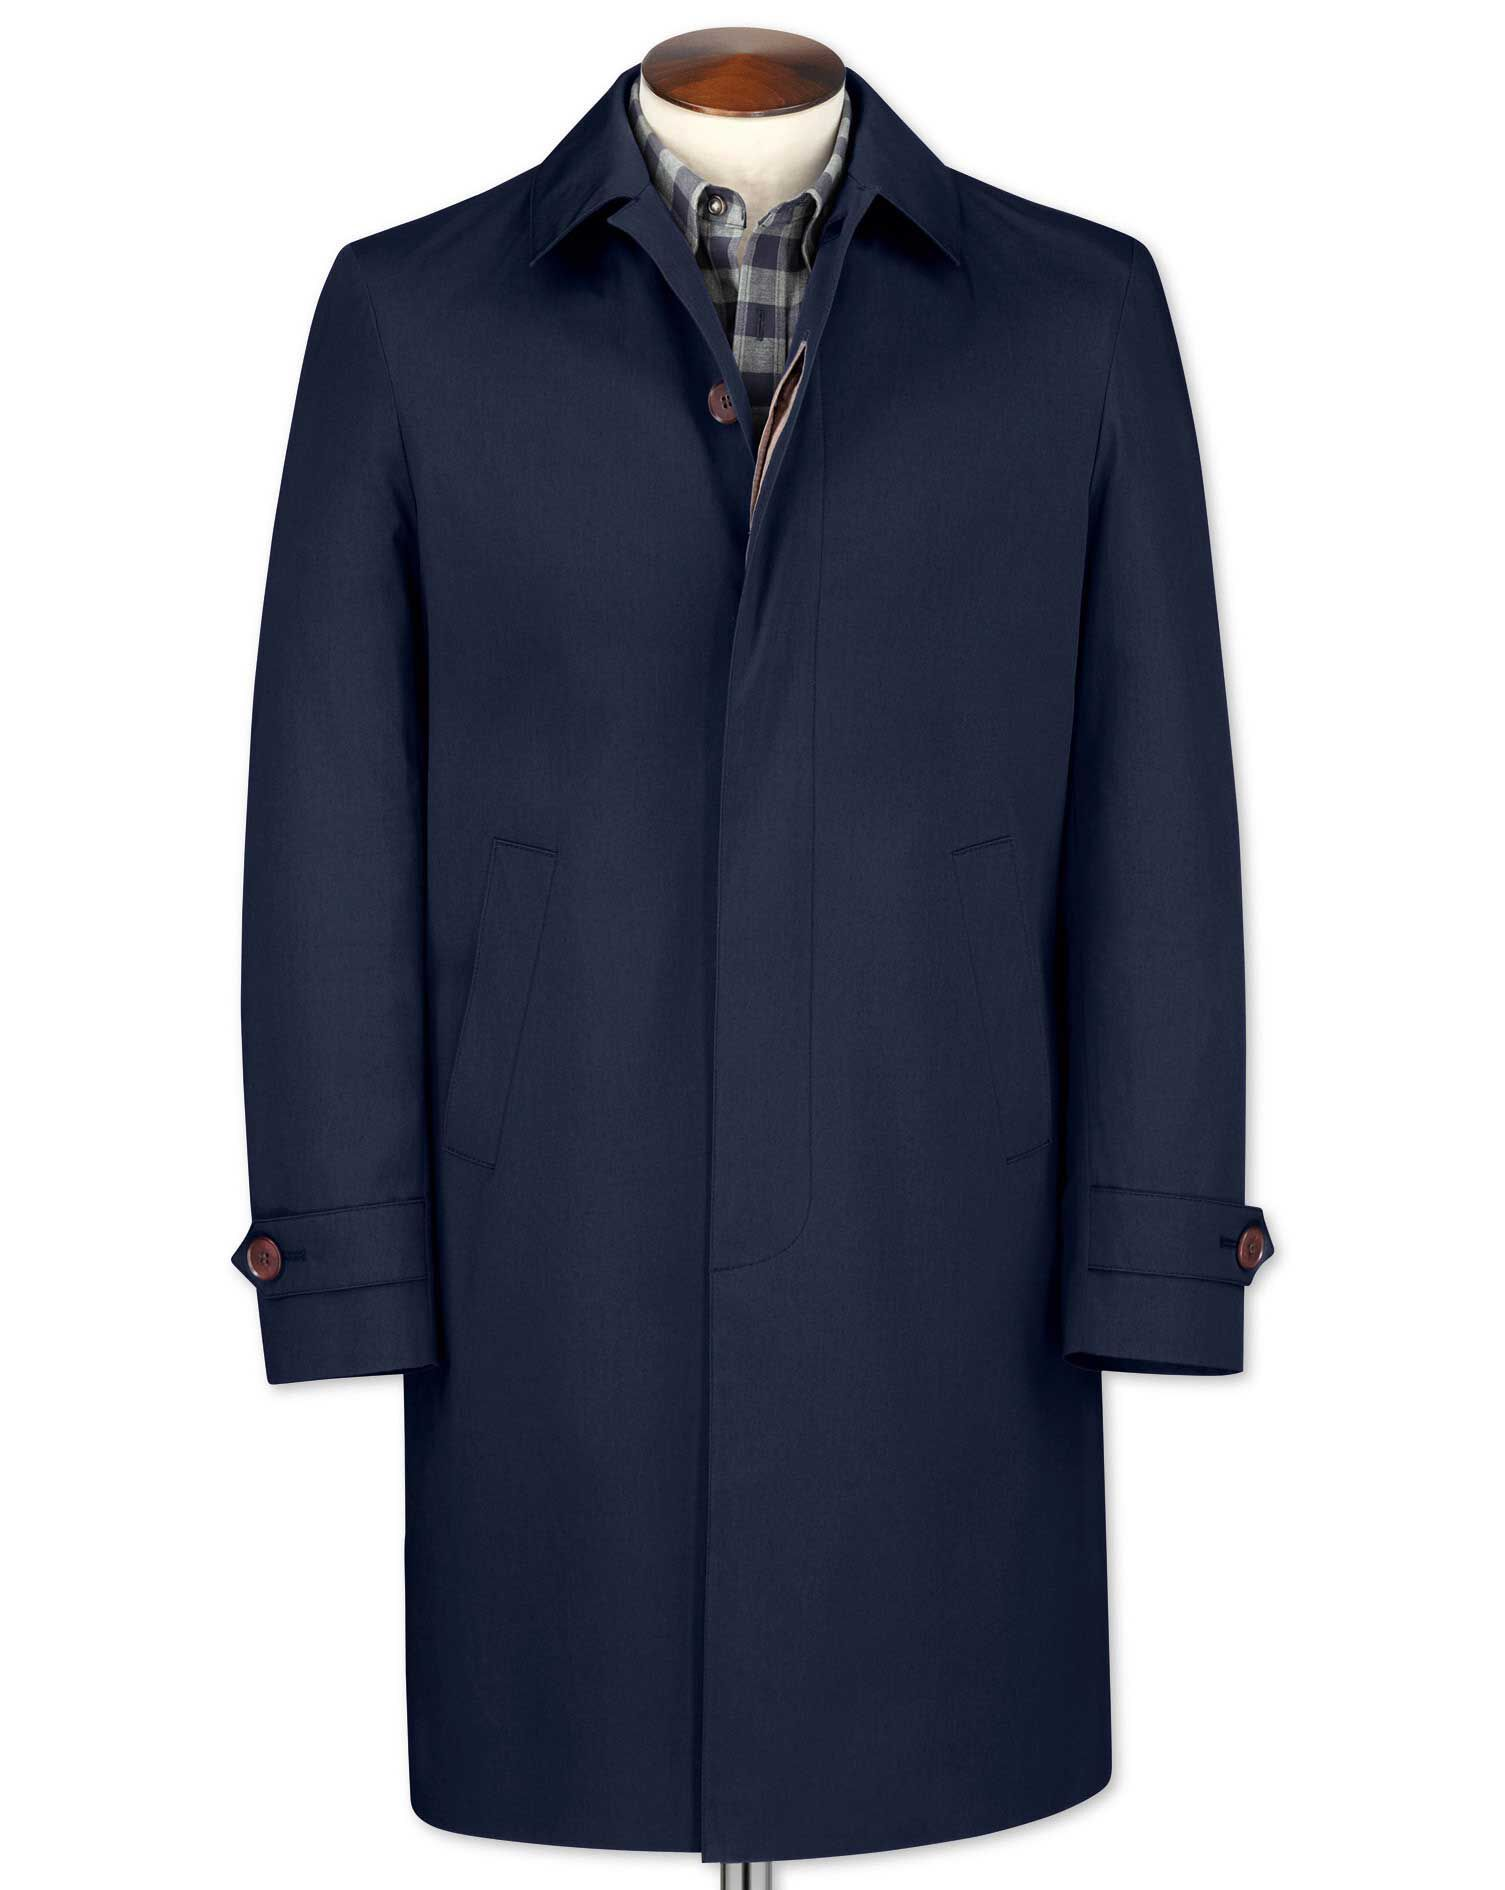 Men's Vintage Style Coats and Jackets Slim Fit Blue RainCotton coat Size 48 Regular by Charles Tyrwhitt £99.00 AT vintagedancer.com